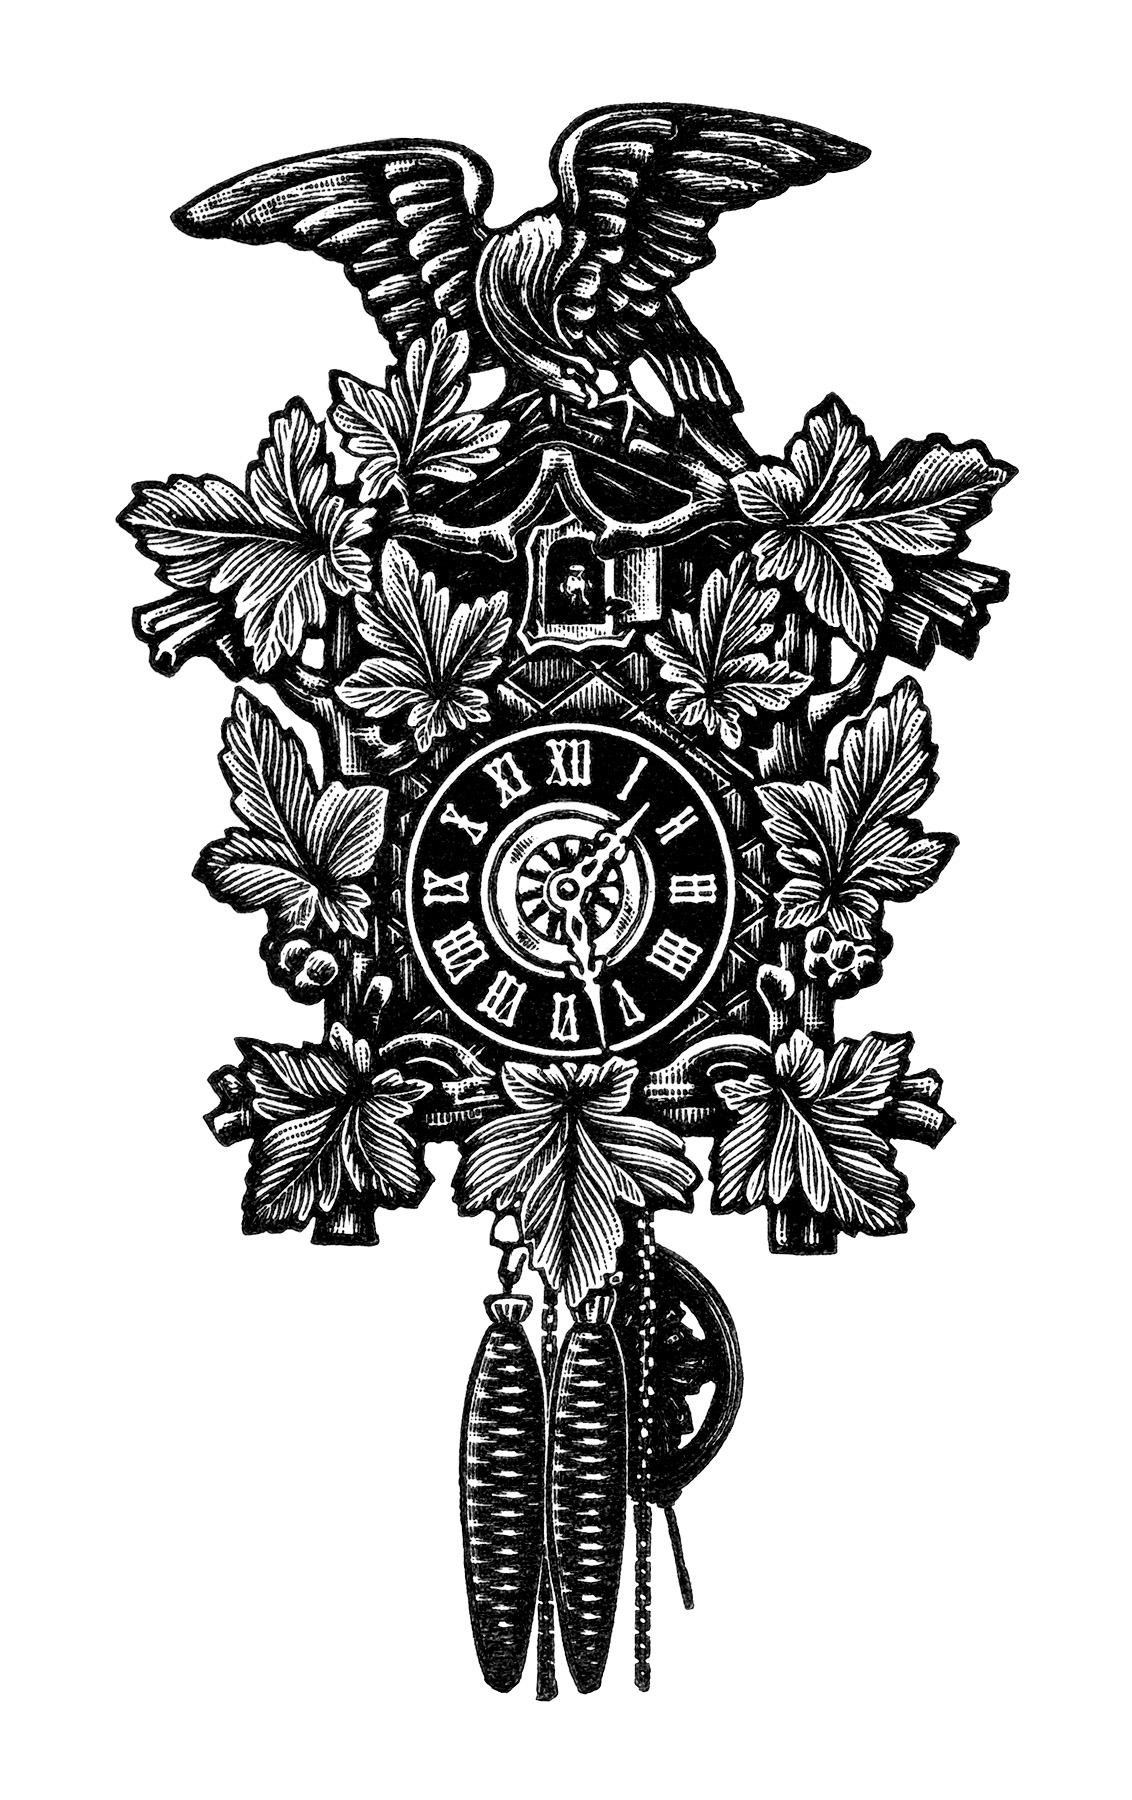 cuckoo clock clip art free - photo #4